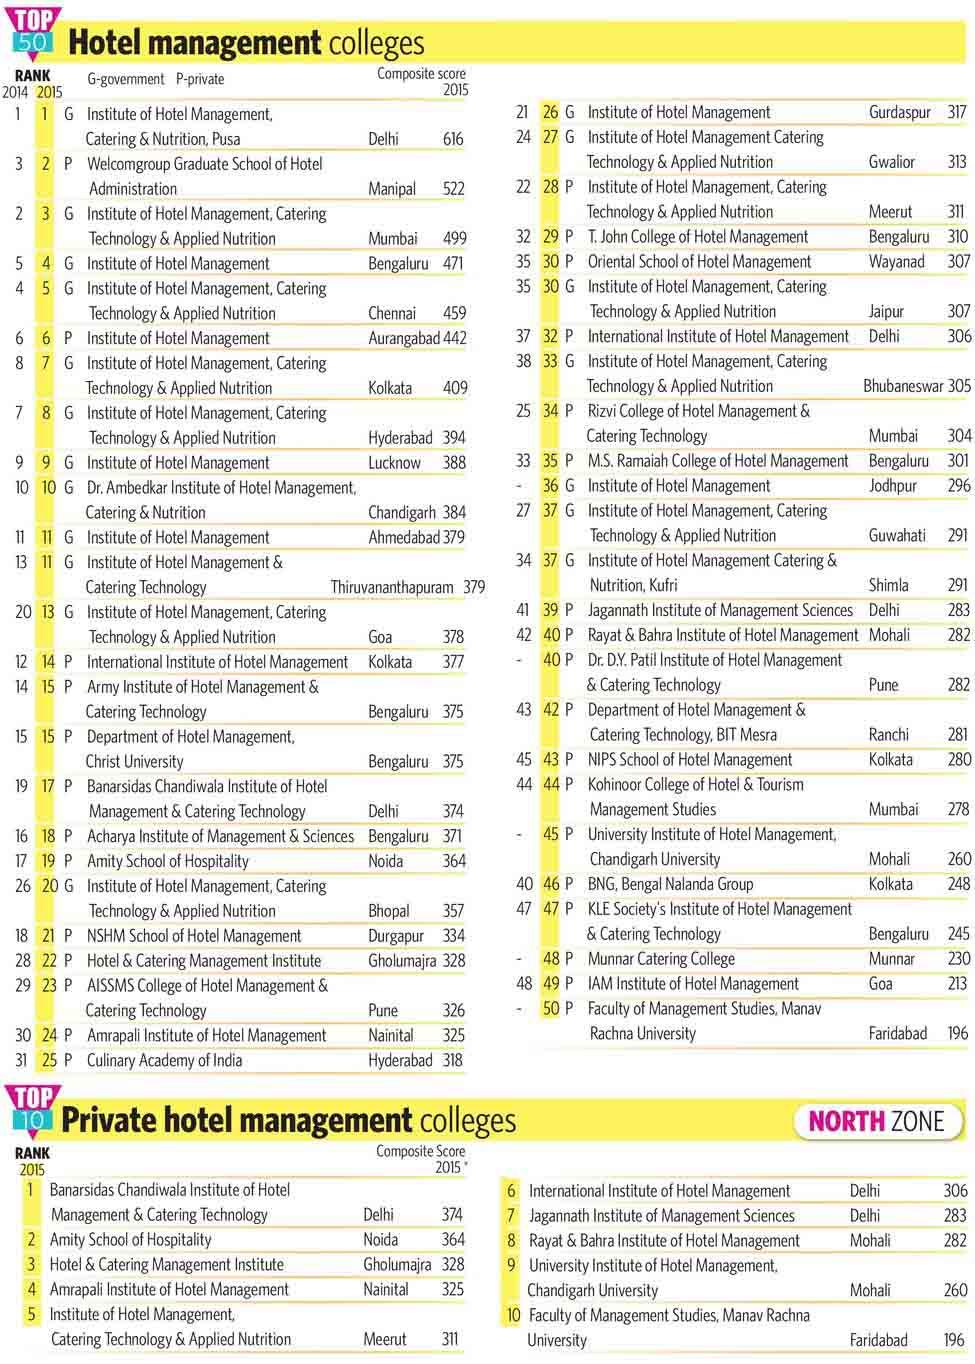 88-Hotel-management-colleges